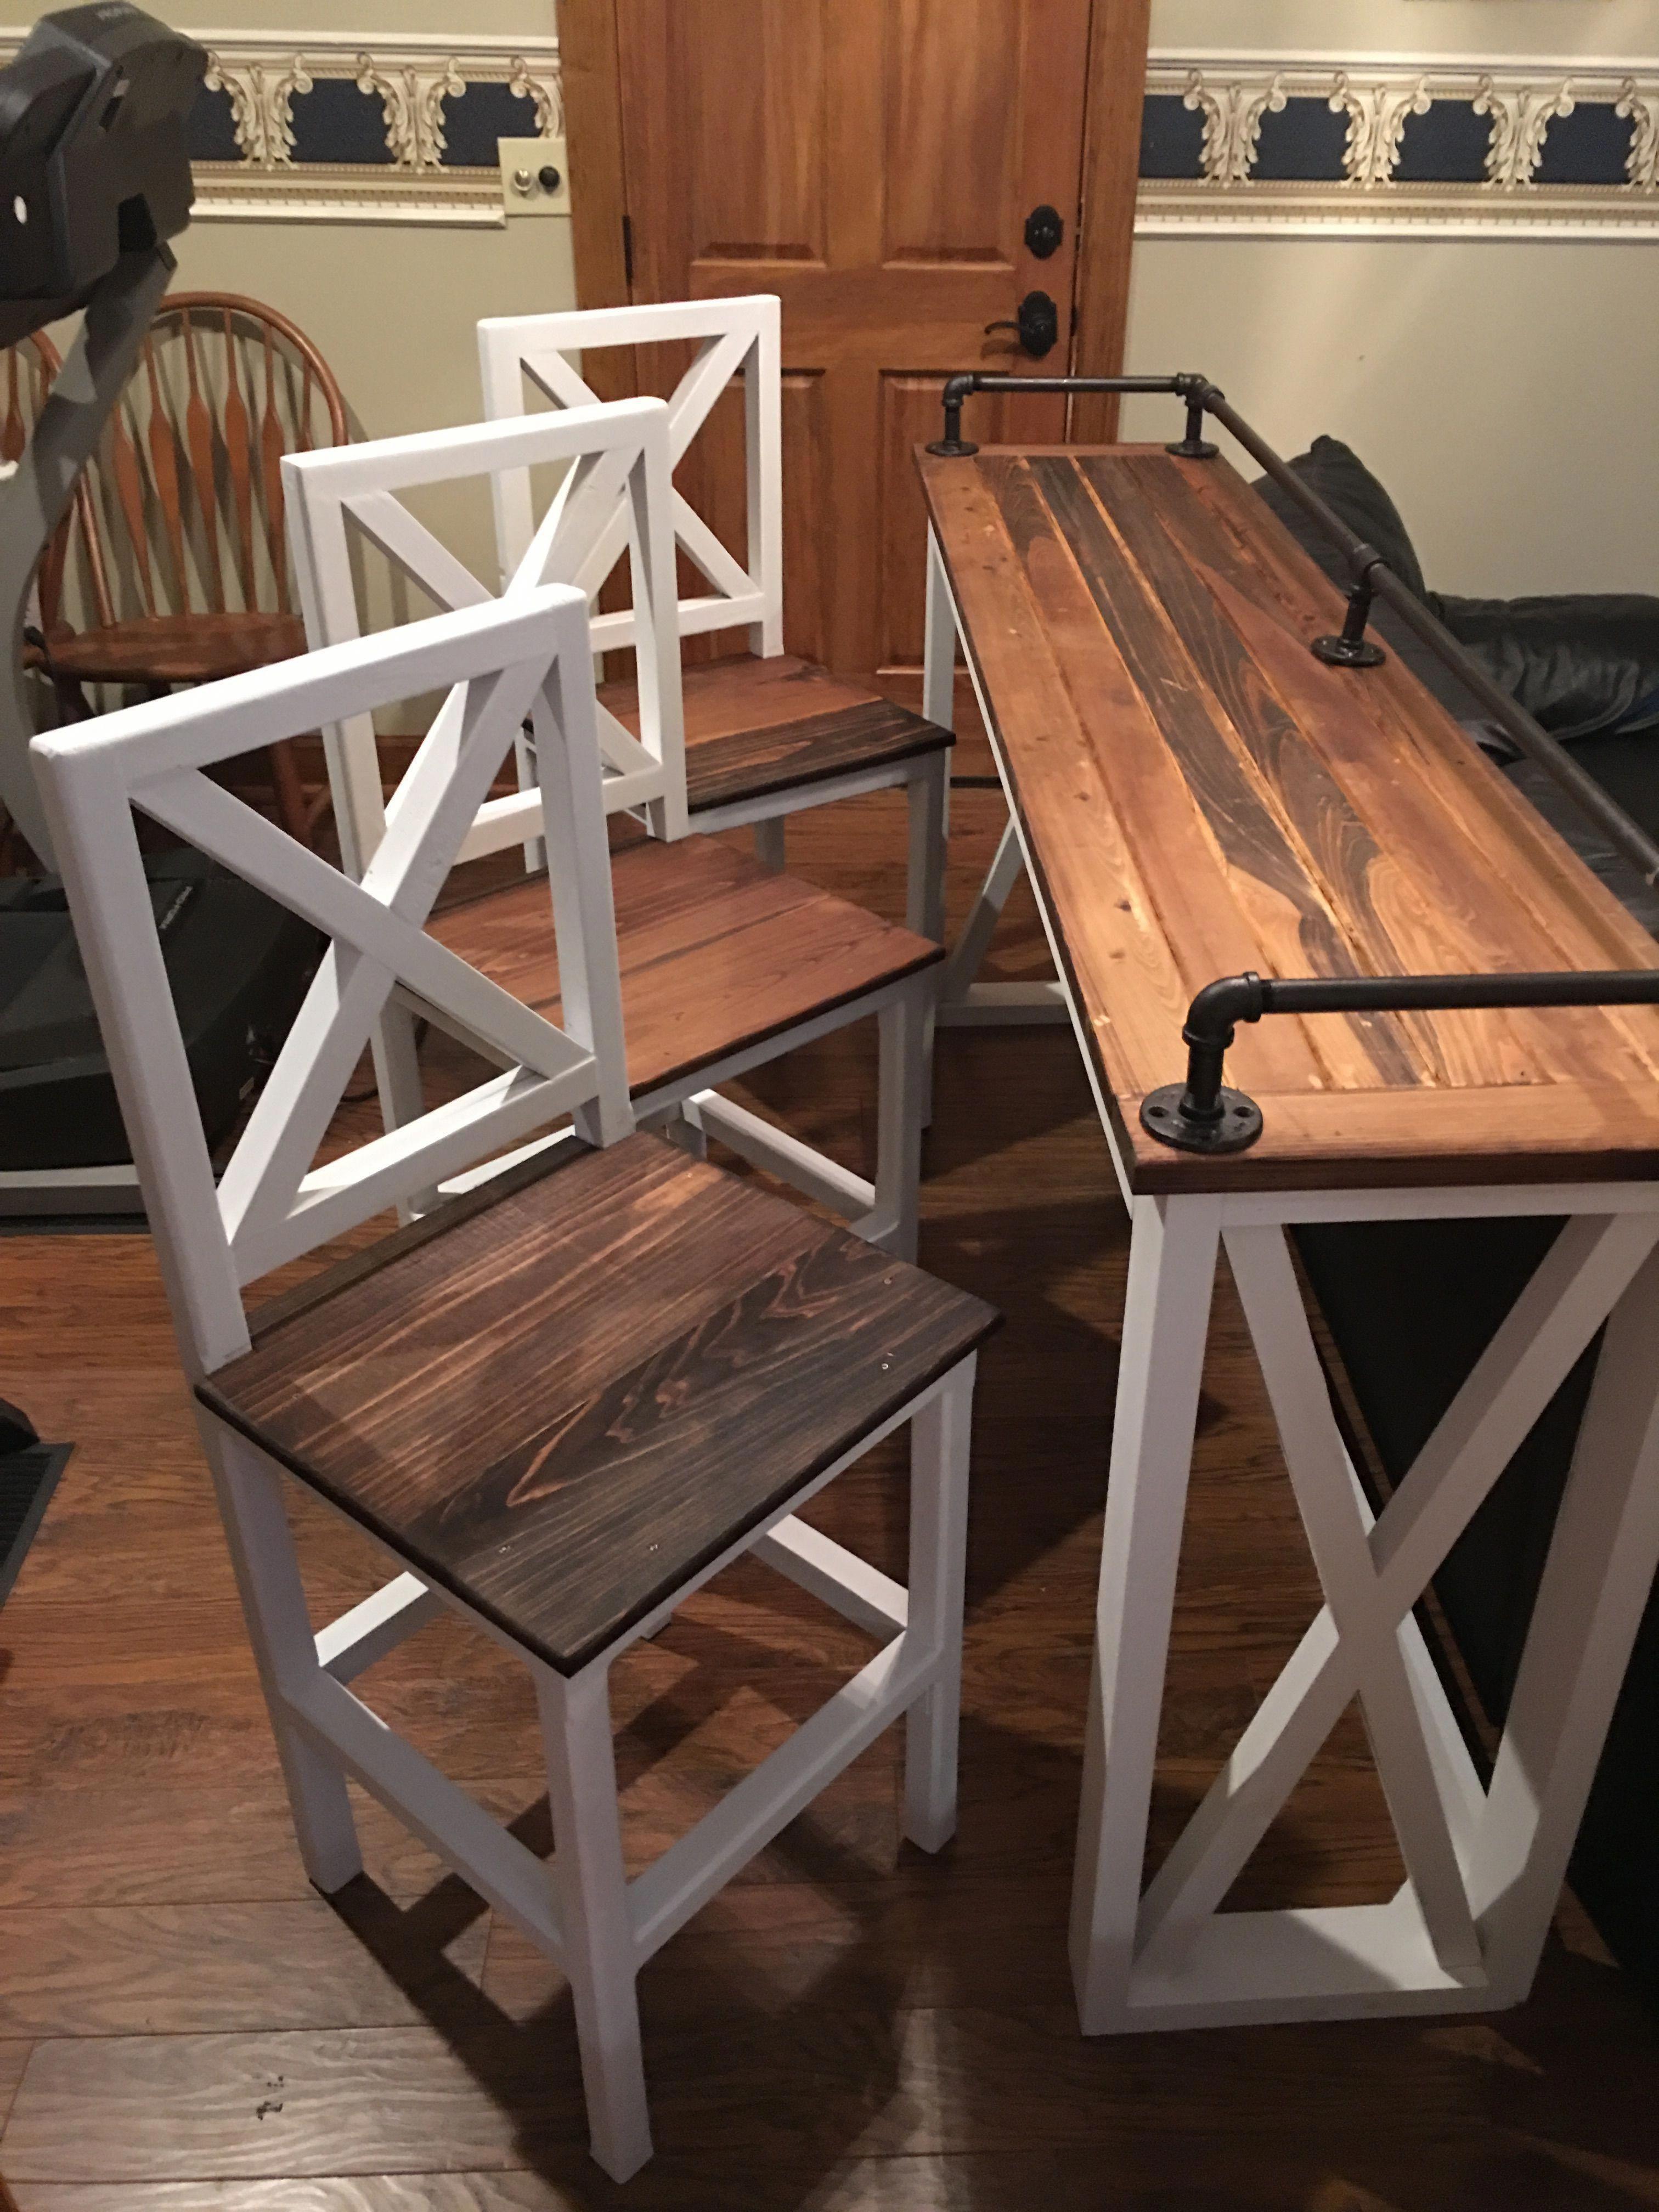 Rec Room Bar Designs: Browse Photos Of Basement Rec Room. Find Ideas And